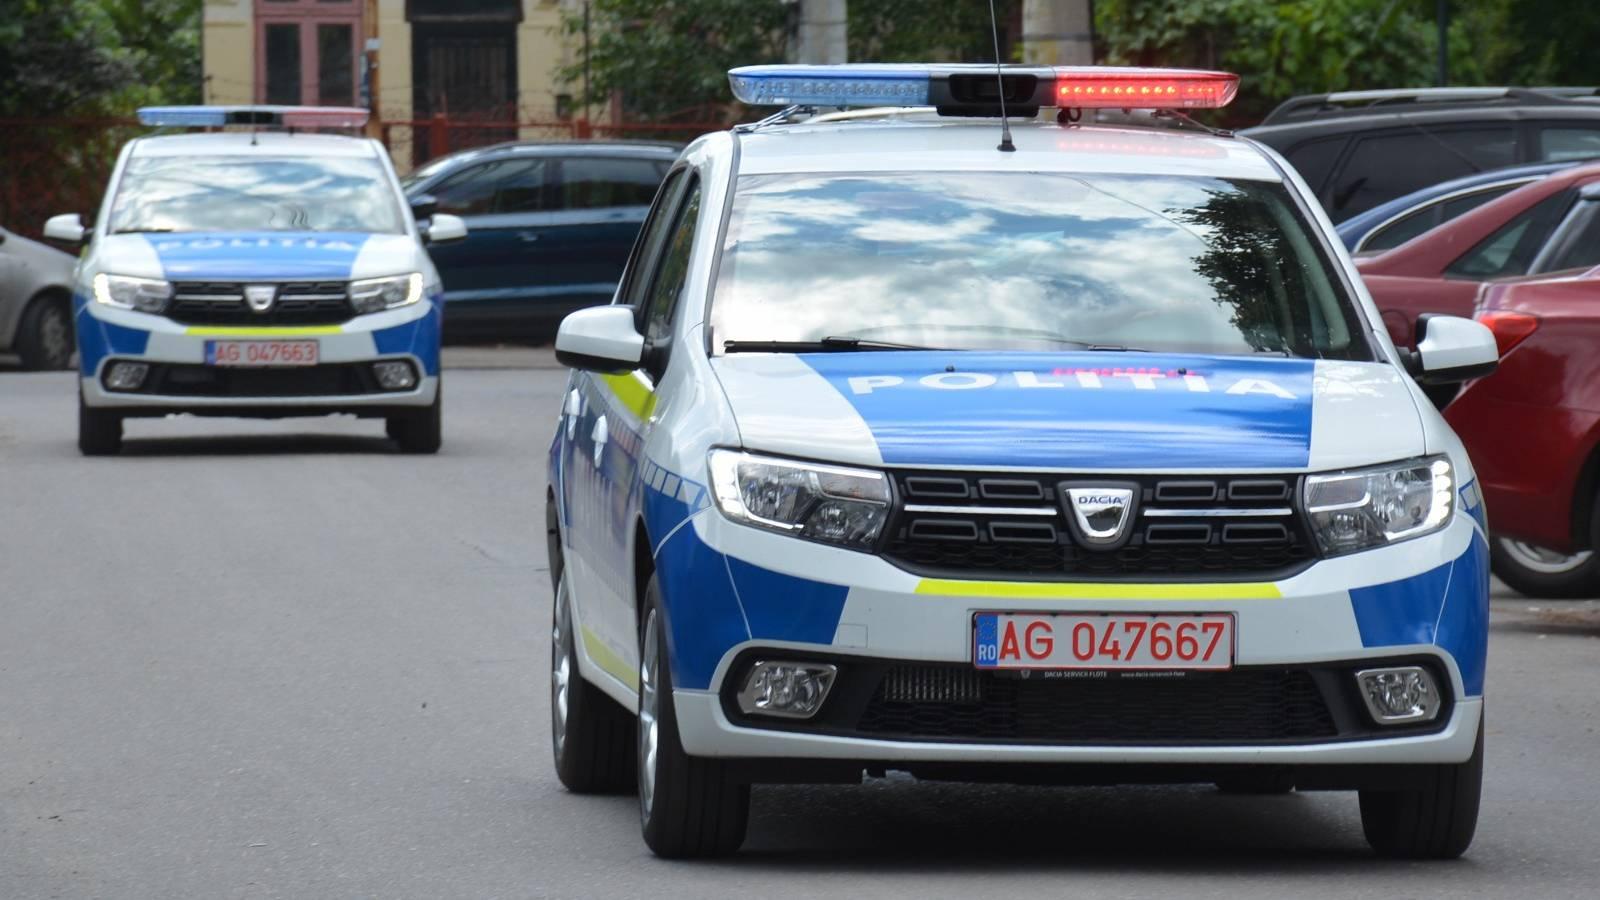 Politia Romana Mesajul Salva Vieti